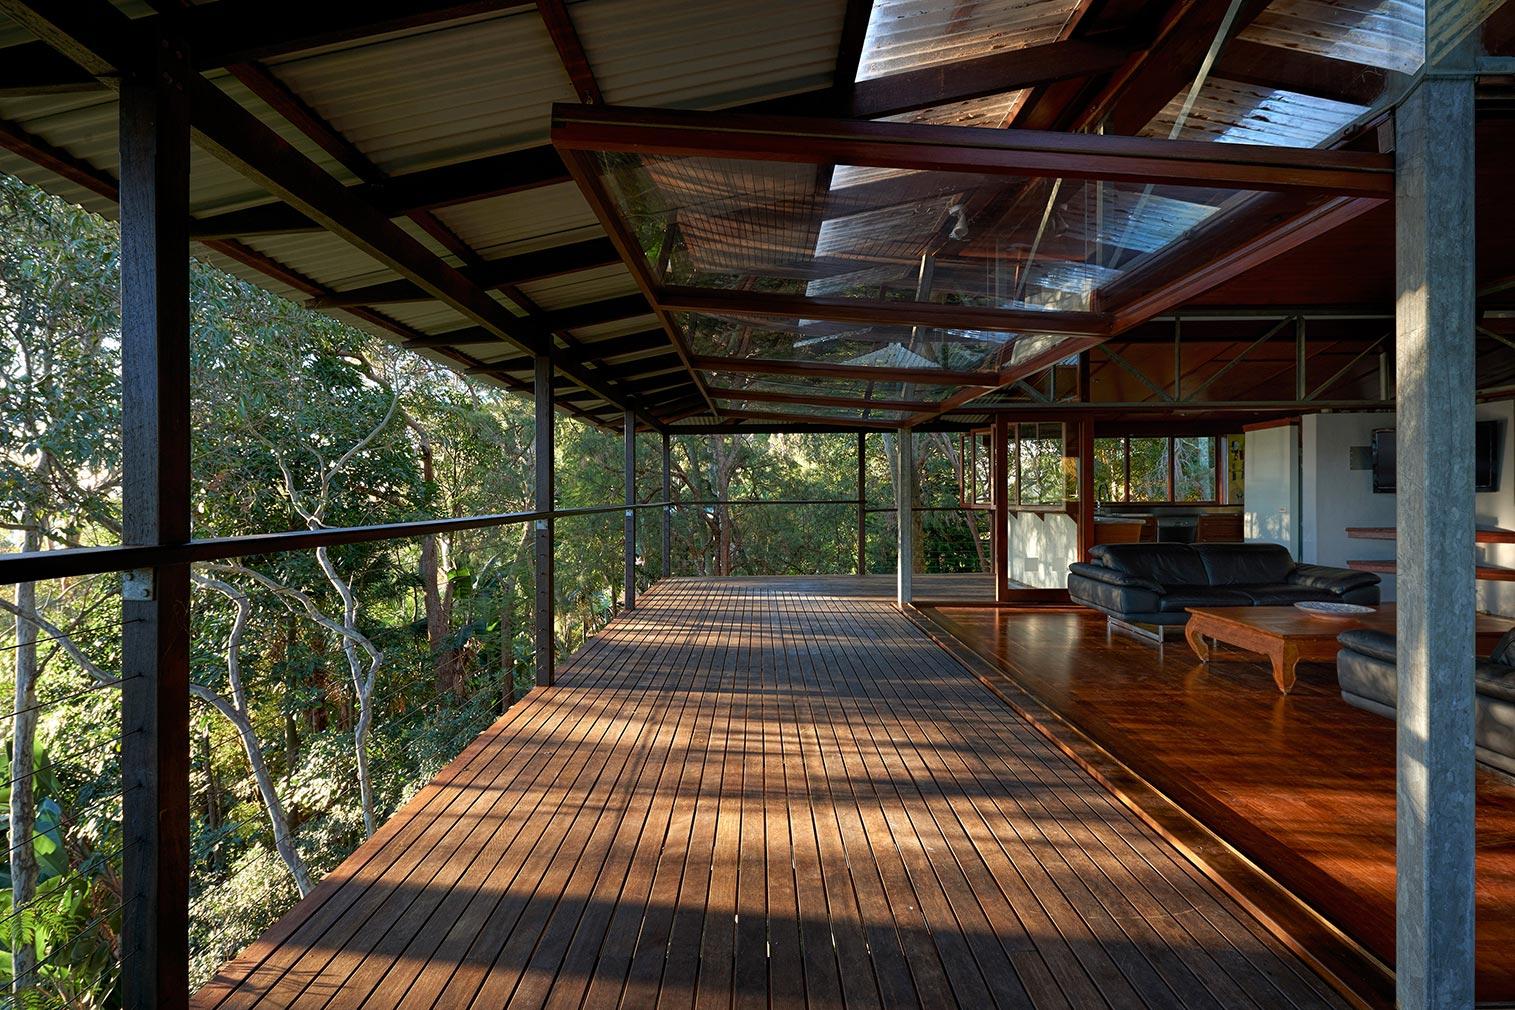 Delightful Treetop House #8: Treetop House By Peter Stutchbury